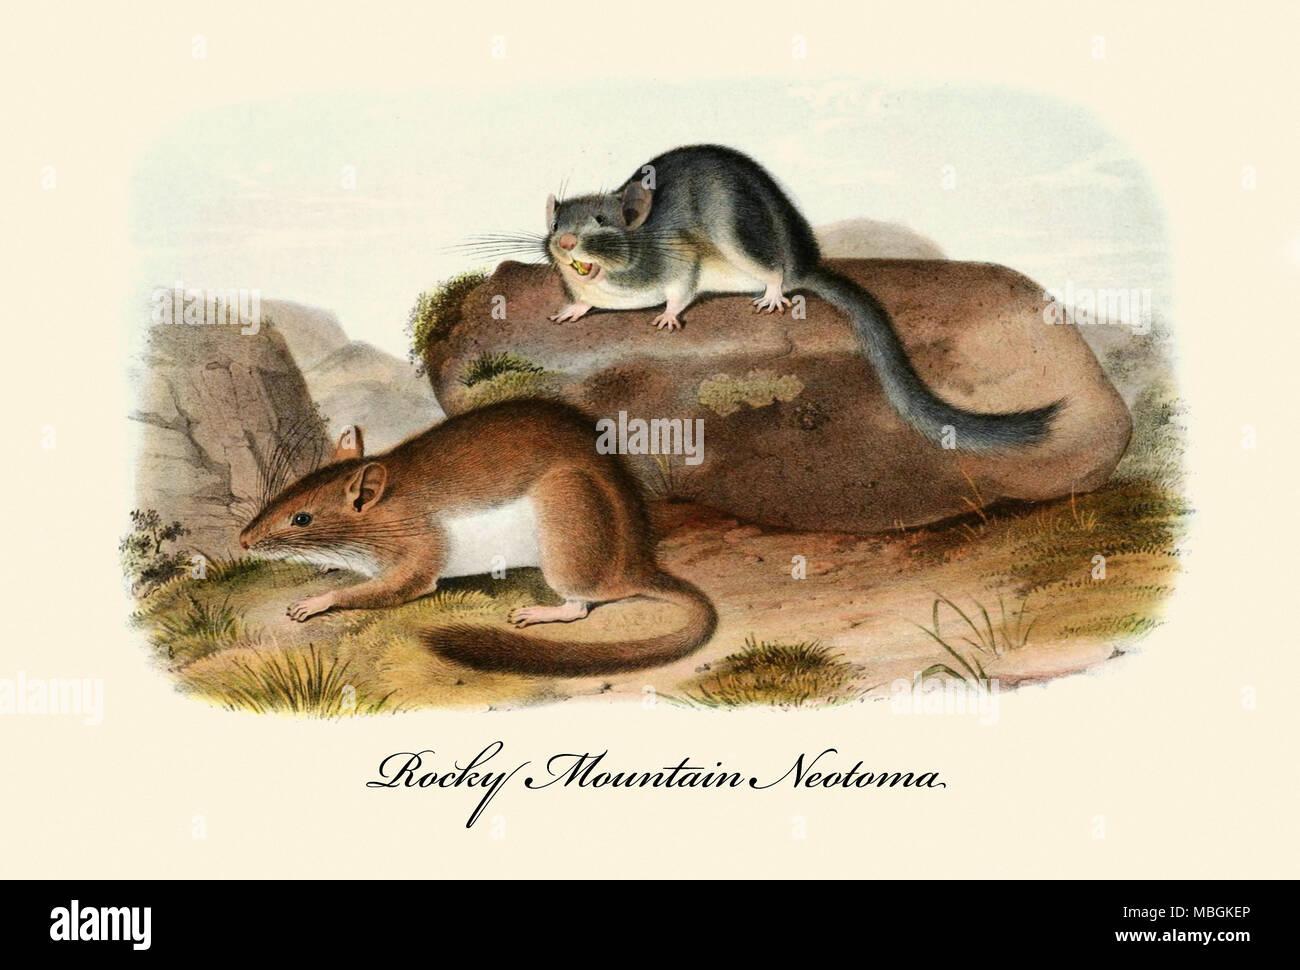 Rocky Mountain Neotoma - Stock Image